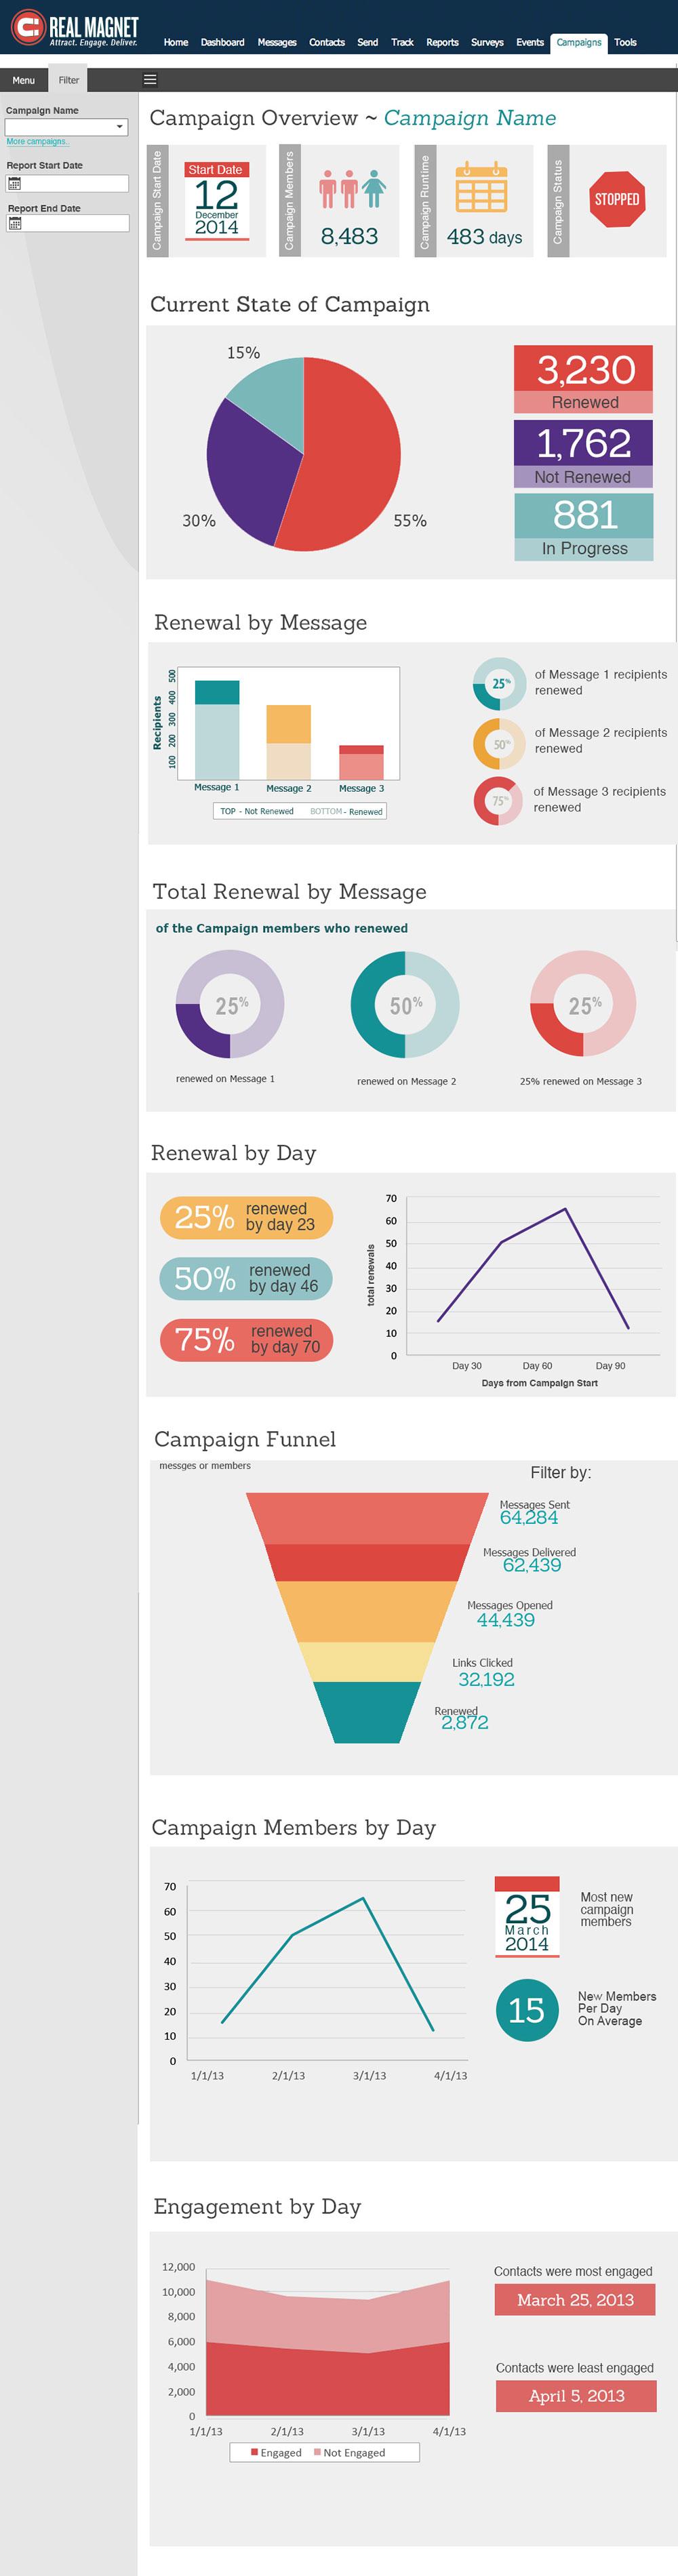 Marketing automation report